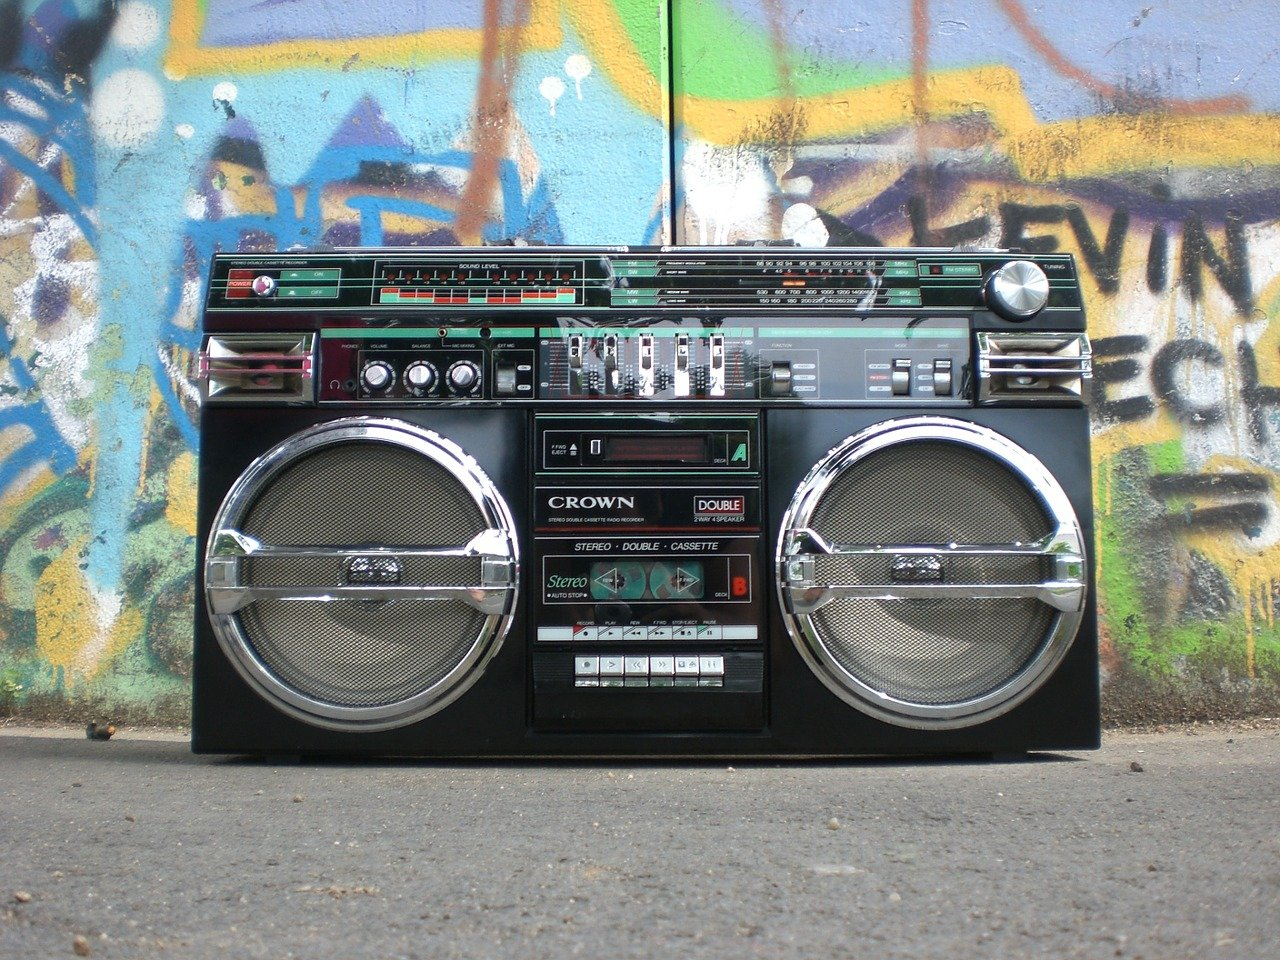 ghettoblaster, radio recorder, boombox